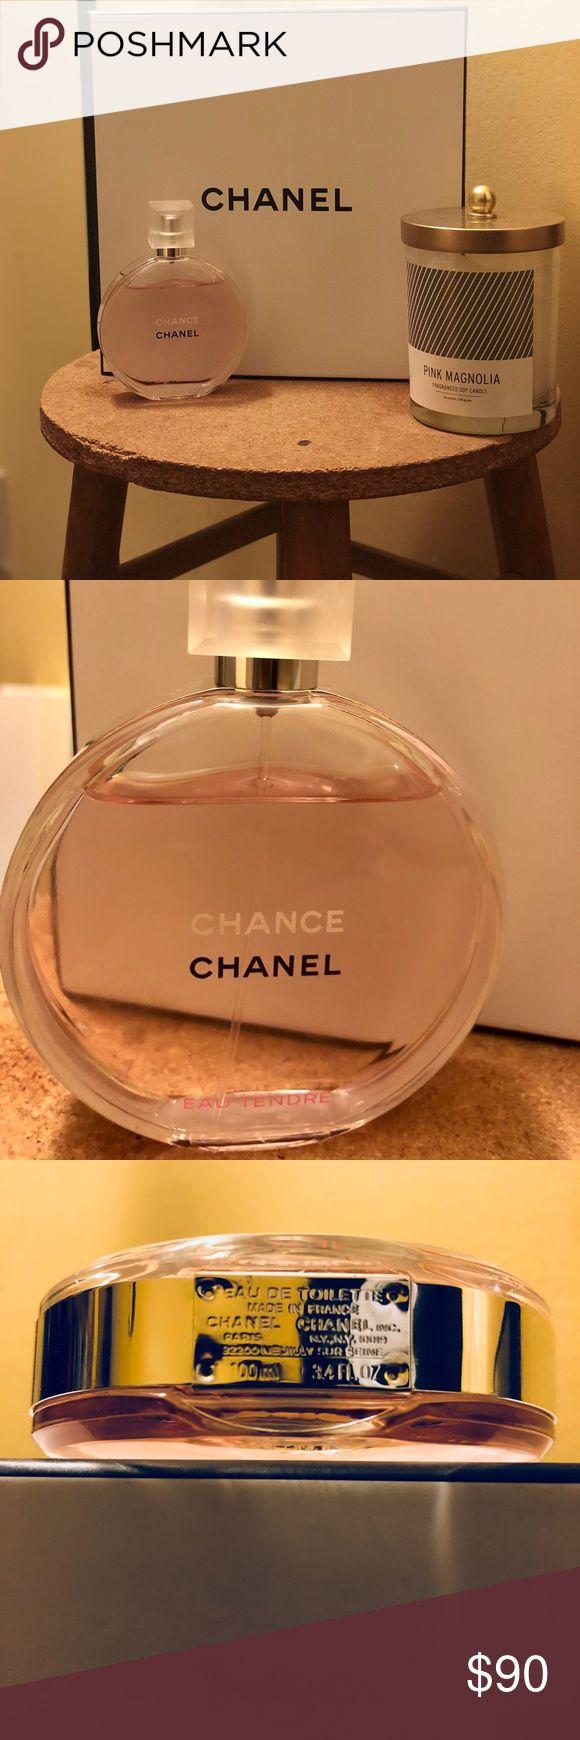 Chanel Chance Eau Tendre - Eau de Toilette, 3.4 oz - Comes w/ Chanel gift set box but no twist & spray - 100% authentic. Purchased at Bloomingdale's in Dec. CHANEL Makeup